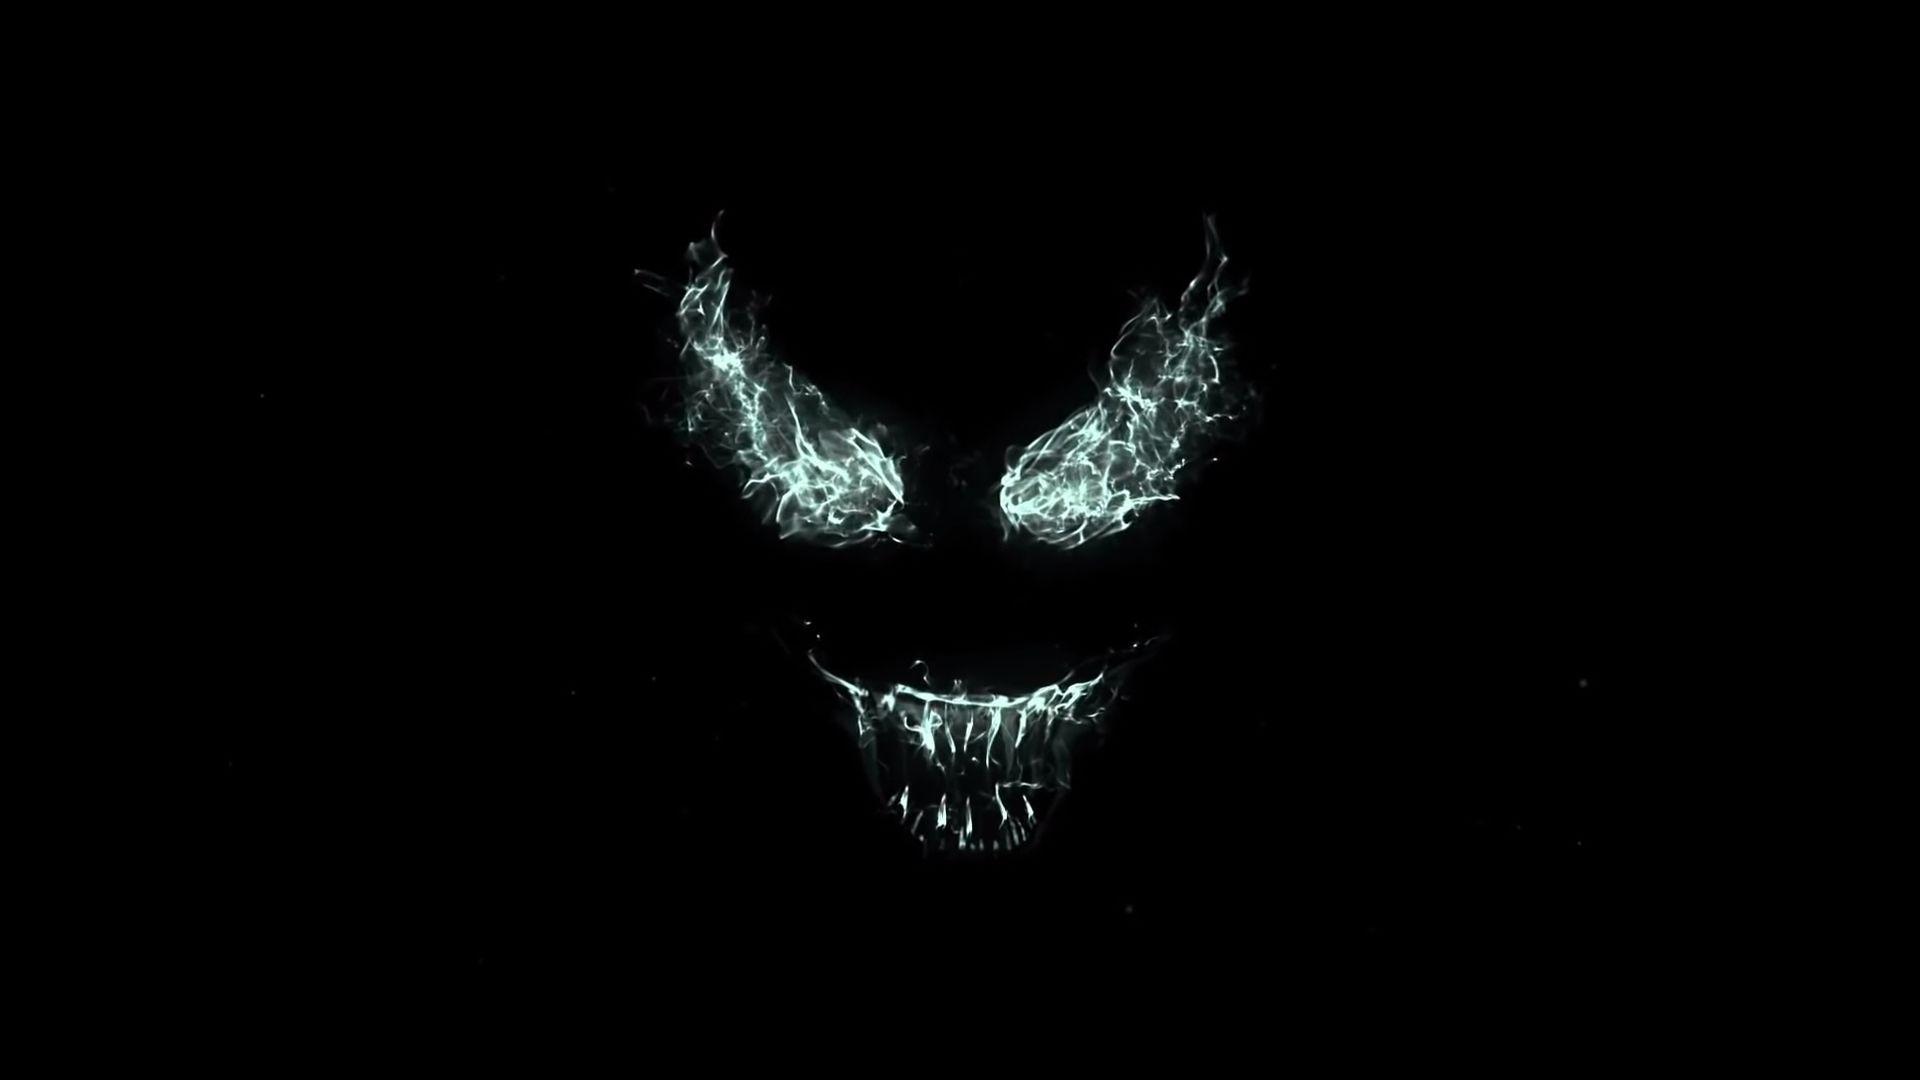 Venom Movie Full HD Laptop Wallpapers   Top Venom Movie Full 1920x1080